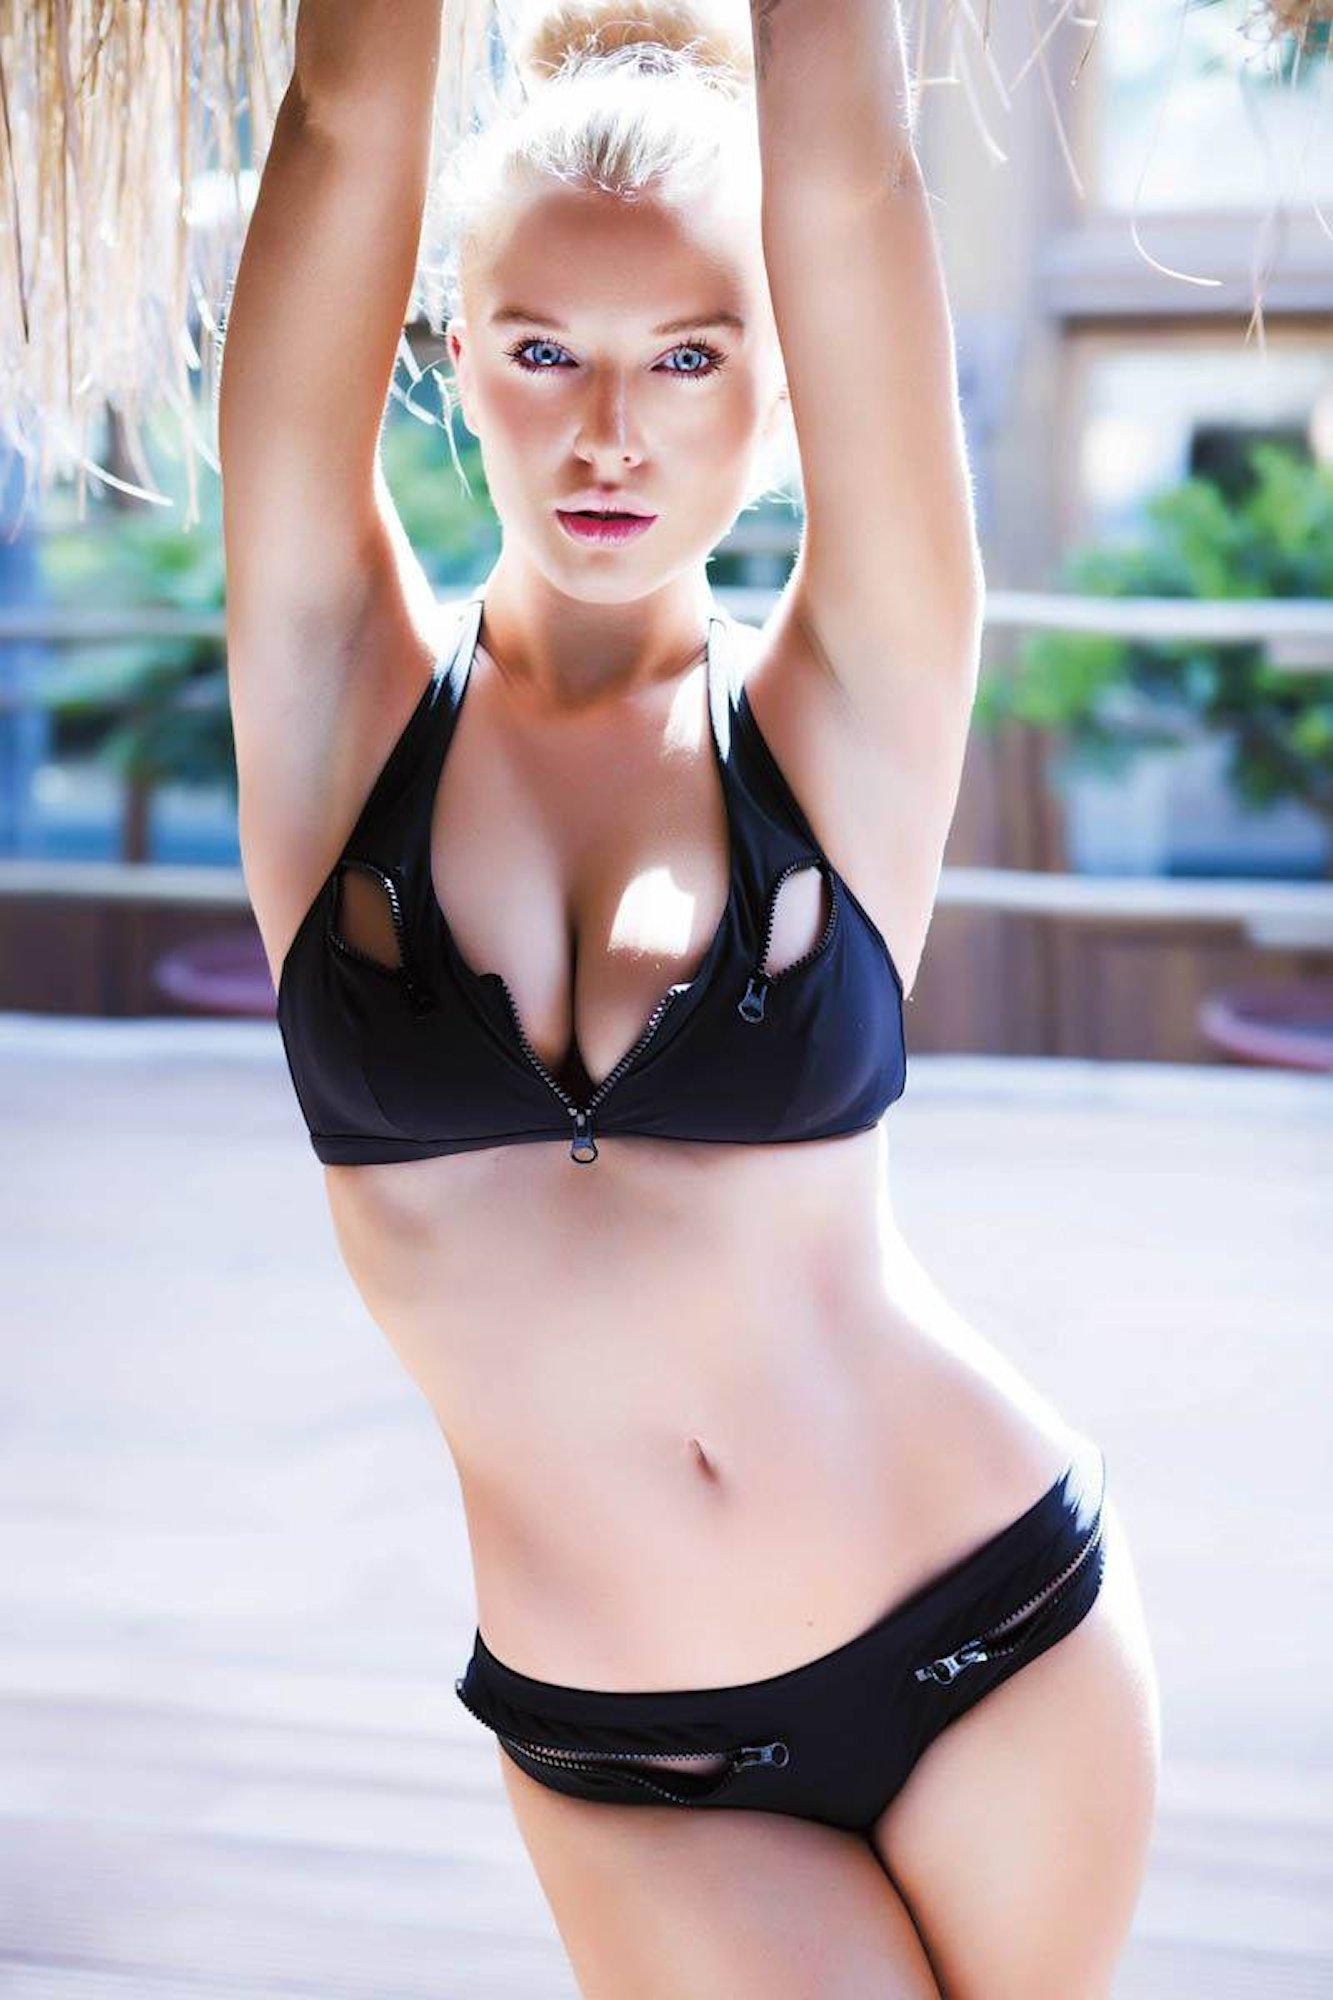 helen flanagan model girl sun good morning